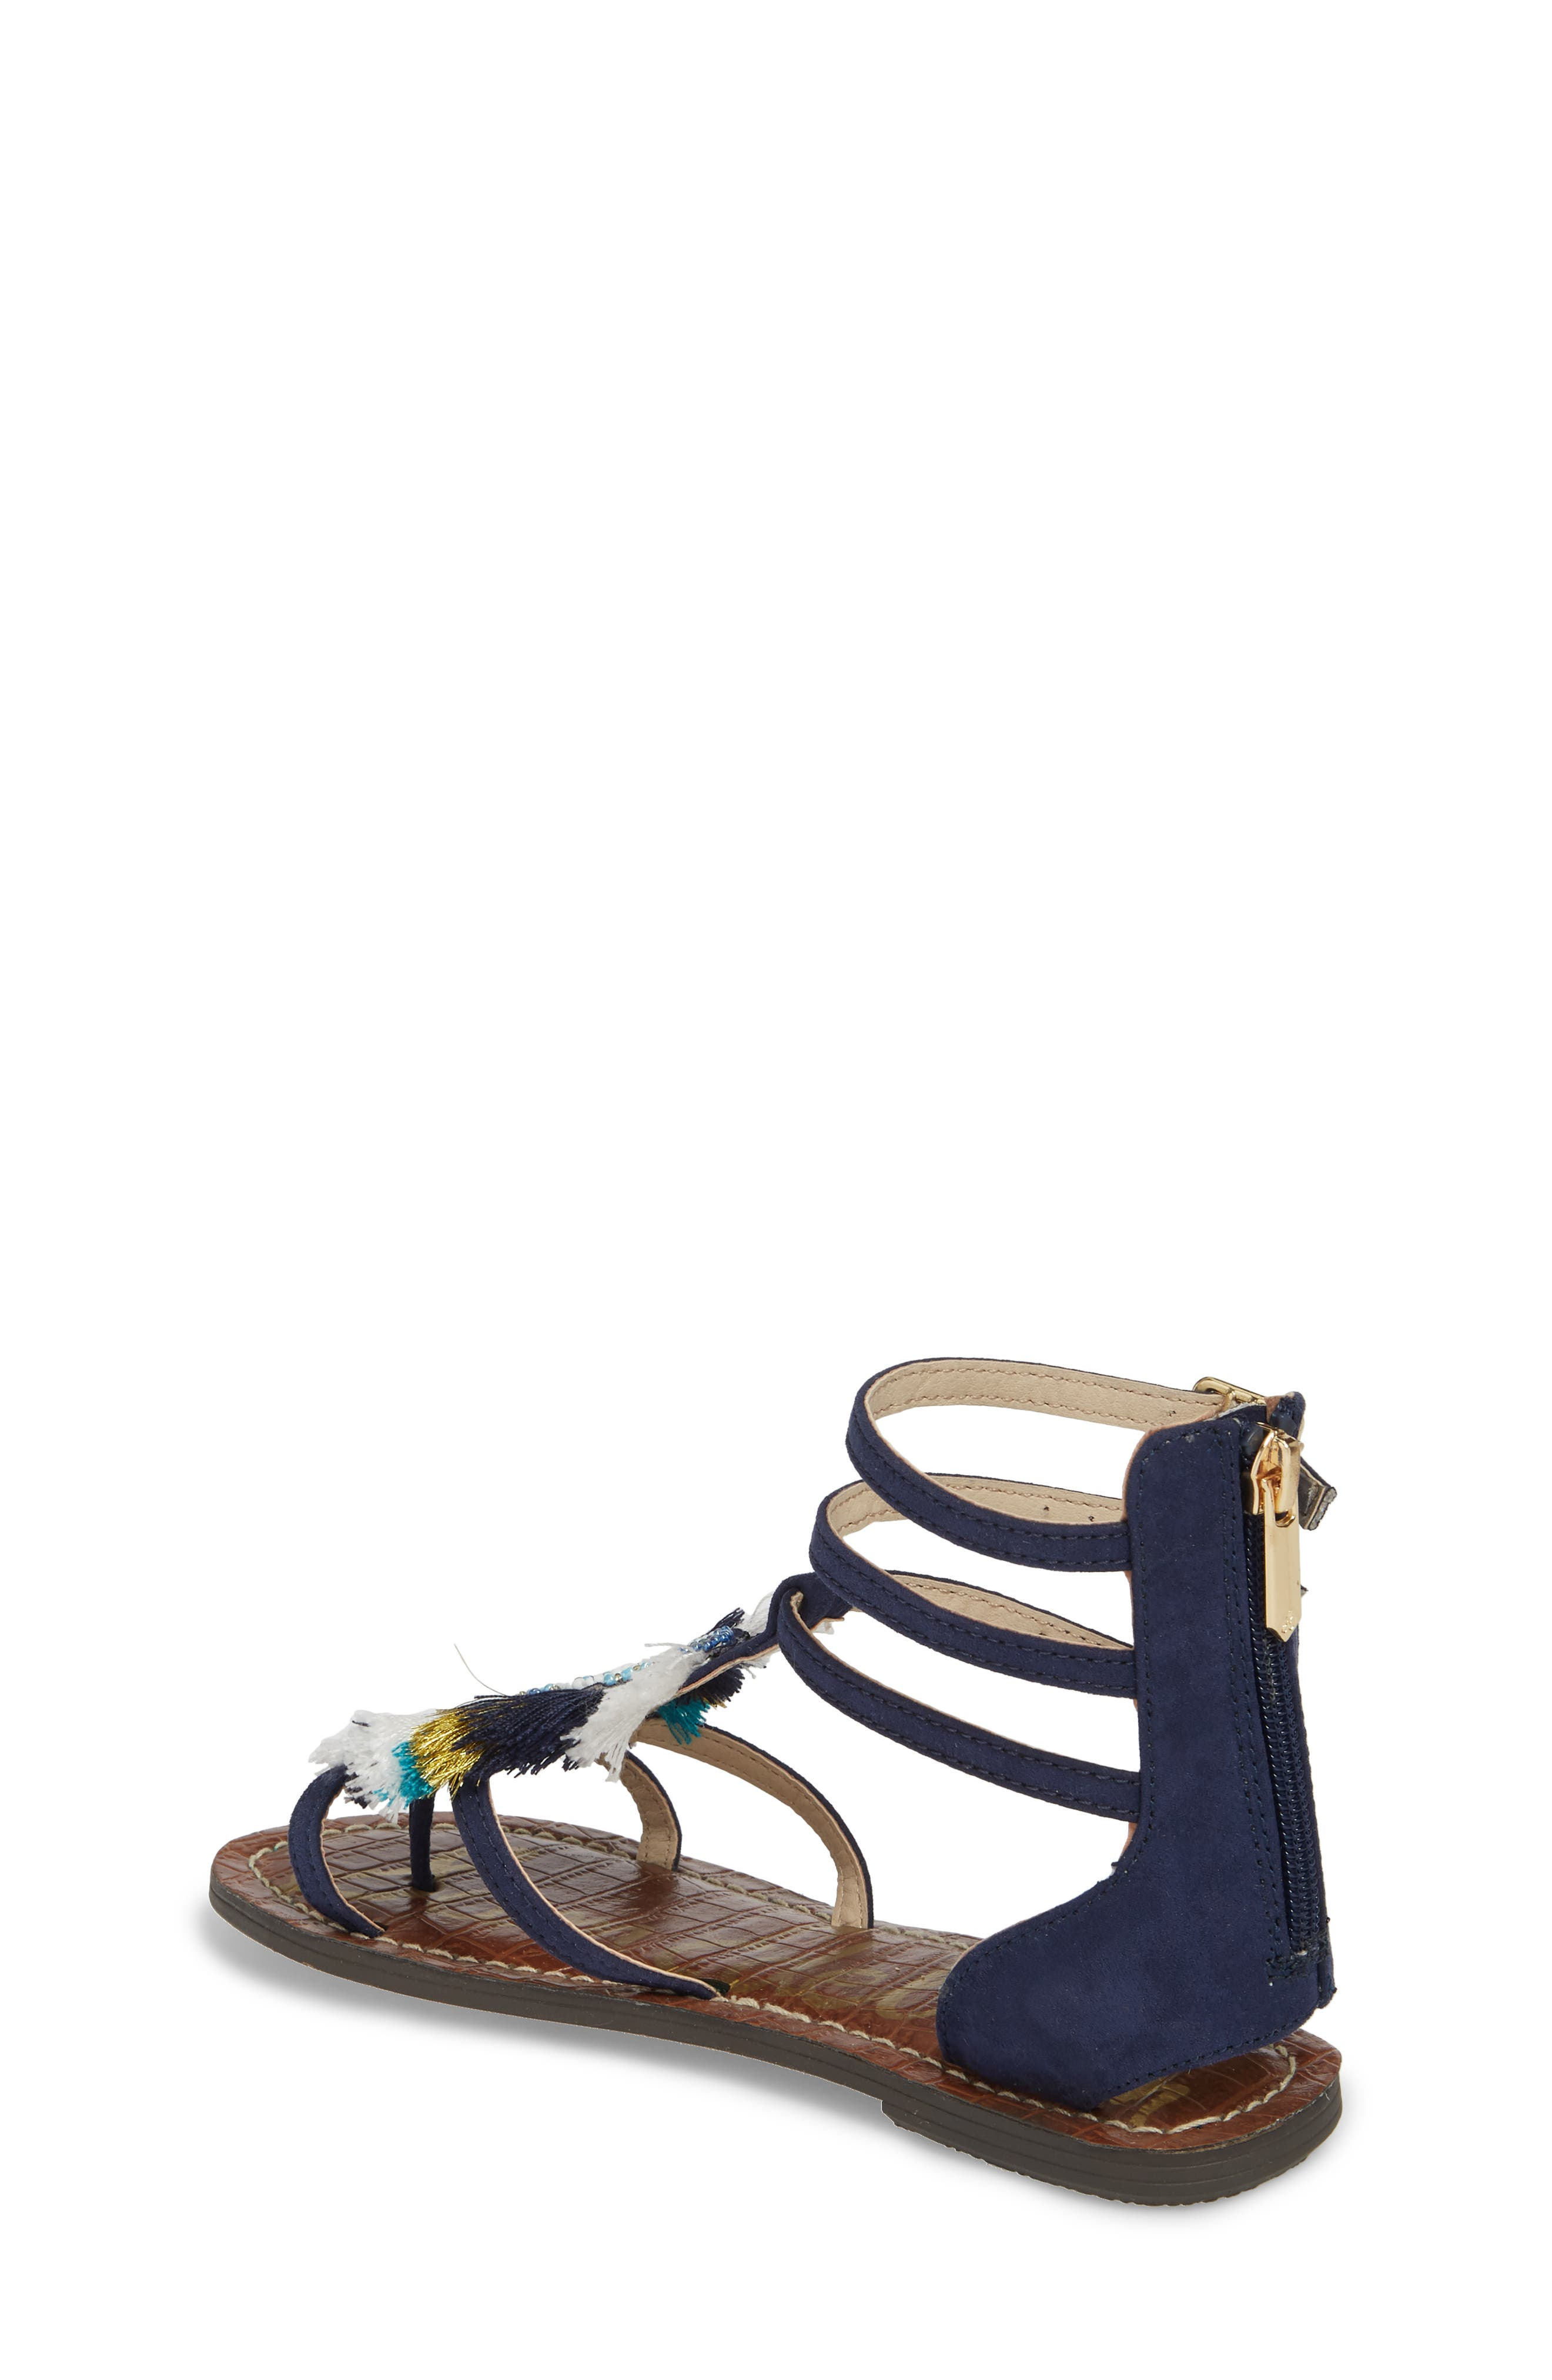 Gigi Giselle Embellished Sandal,                             Alternate thumbnail 2, color,                             410